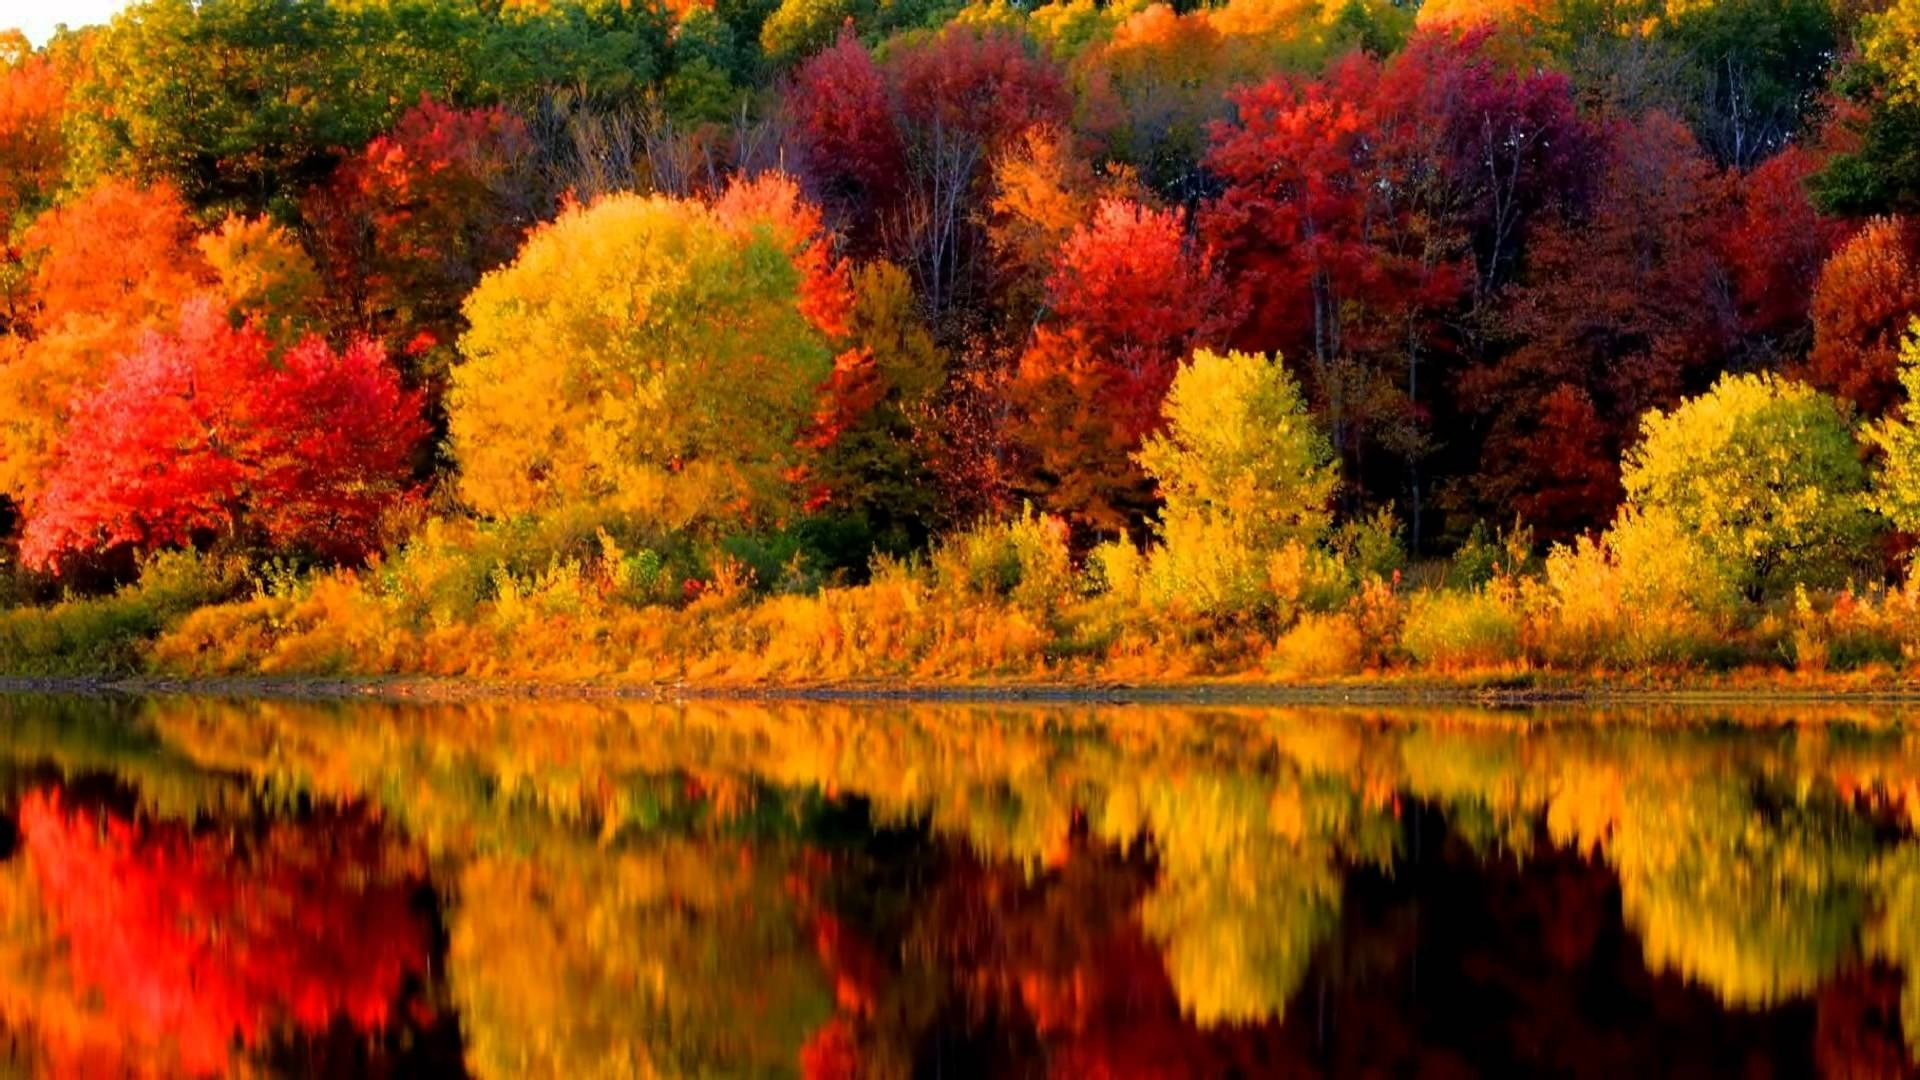 Autumn Leaves - Windows Screen Savers